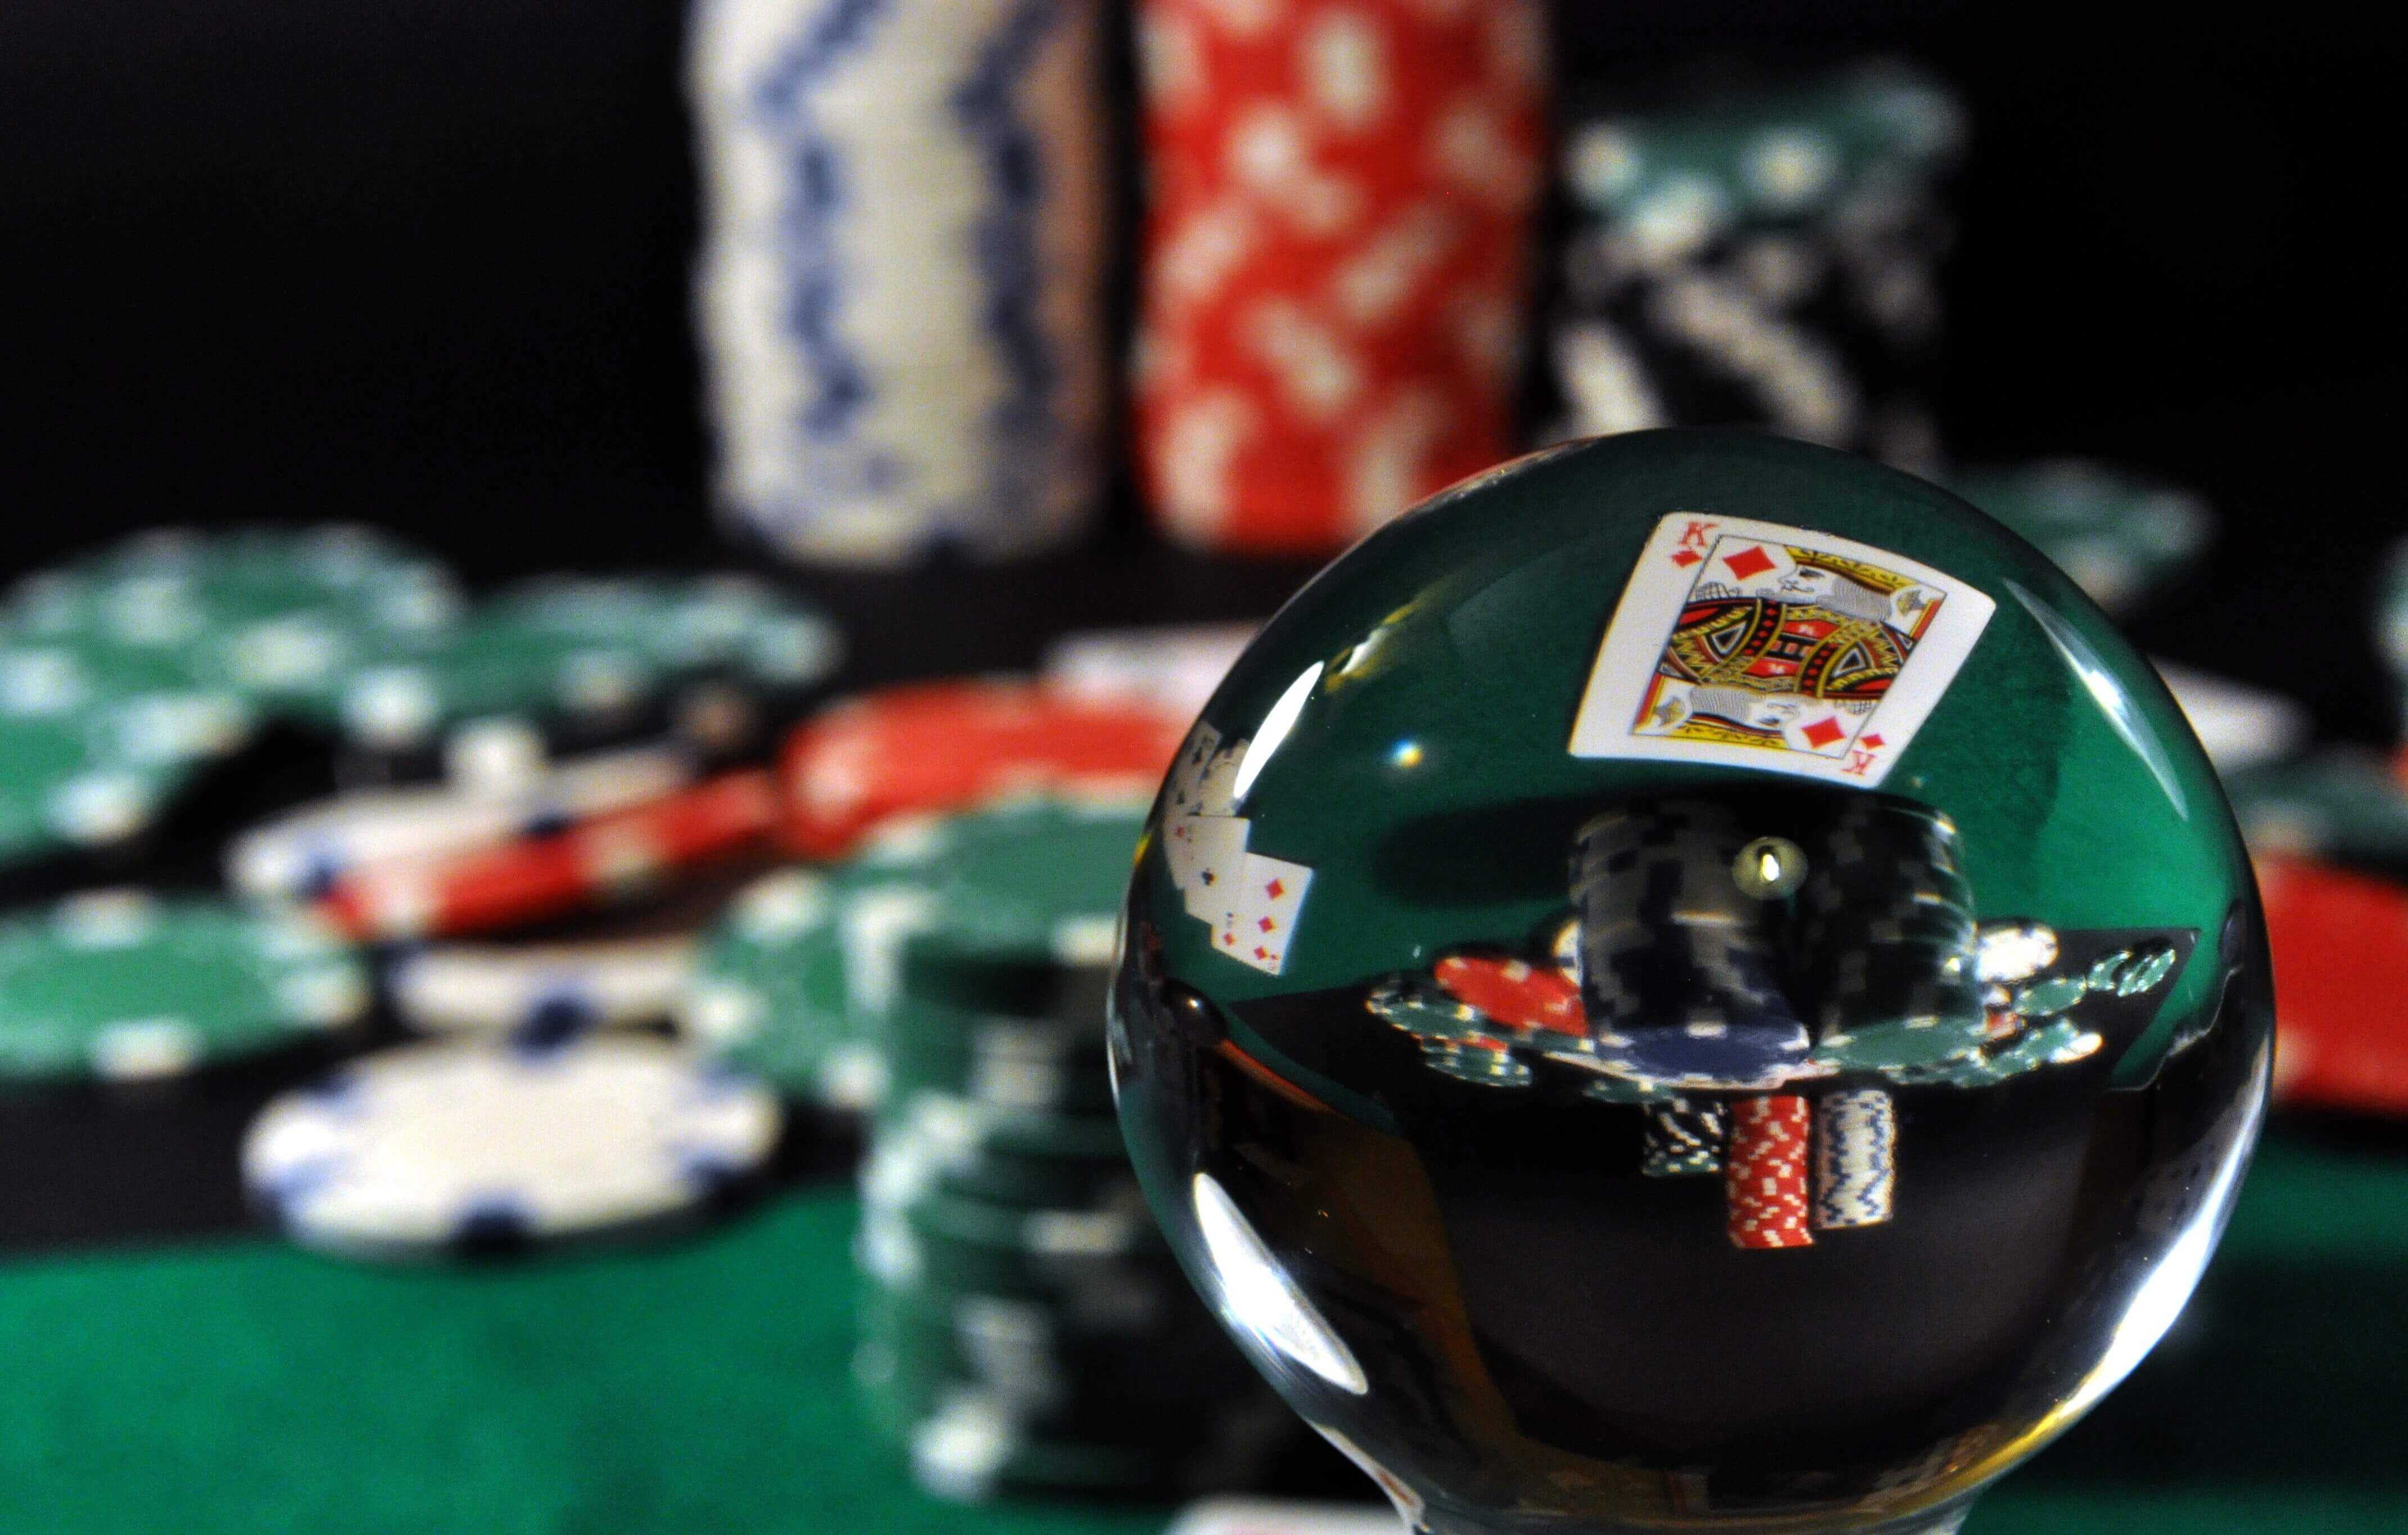 casinobunusar utan svensk licens